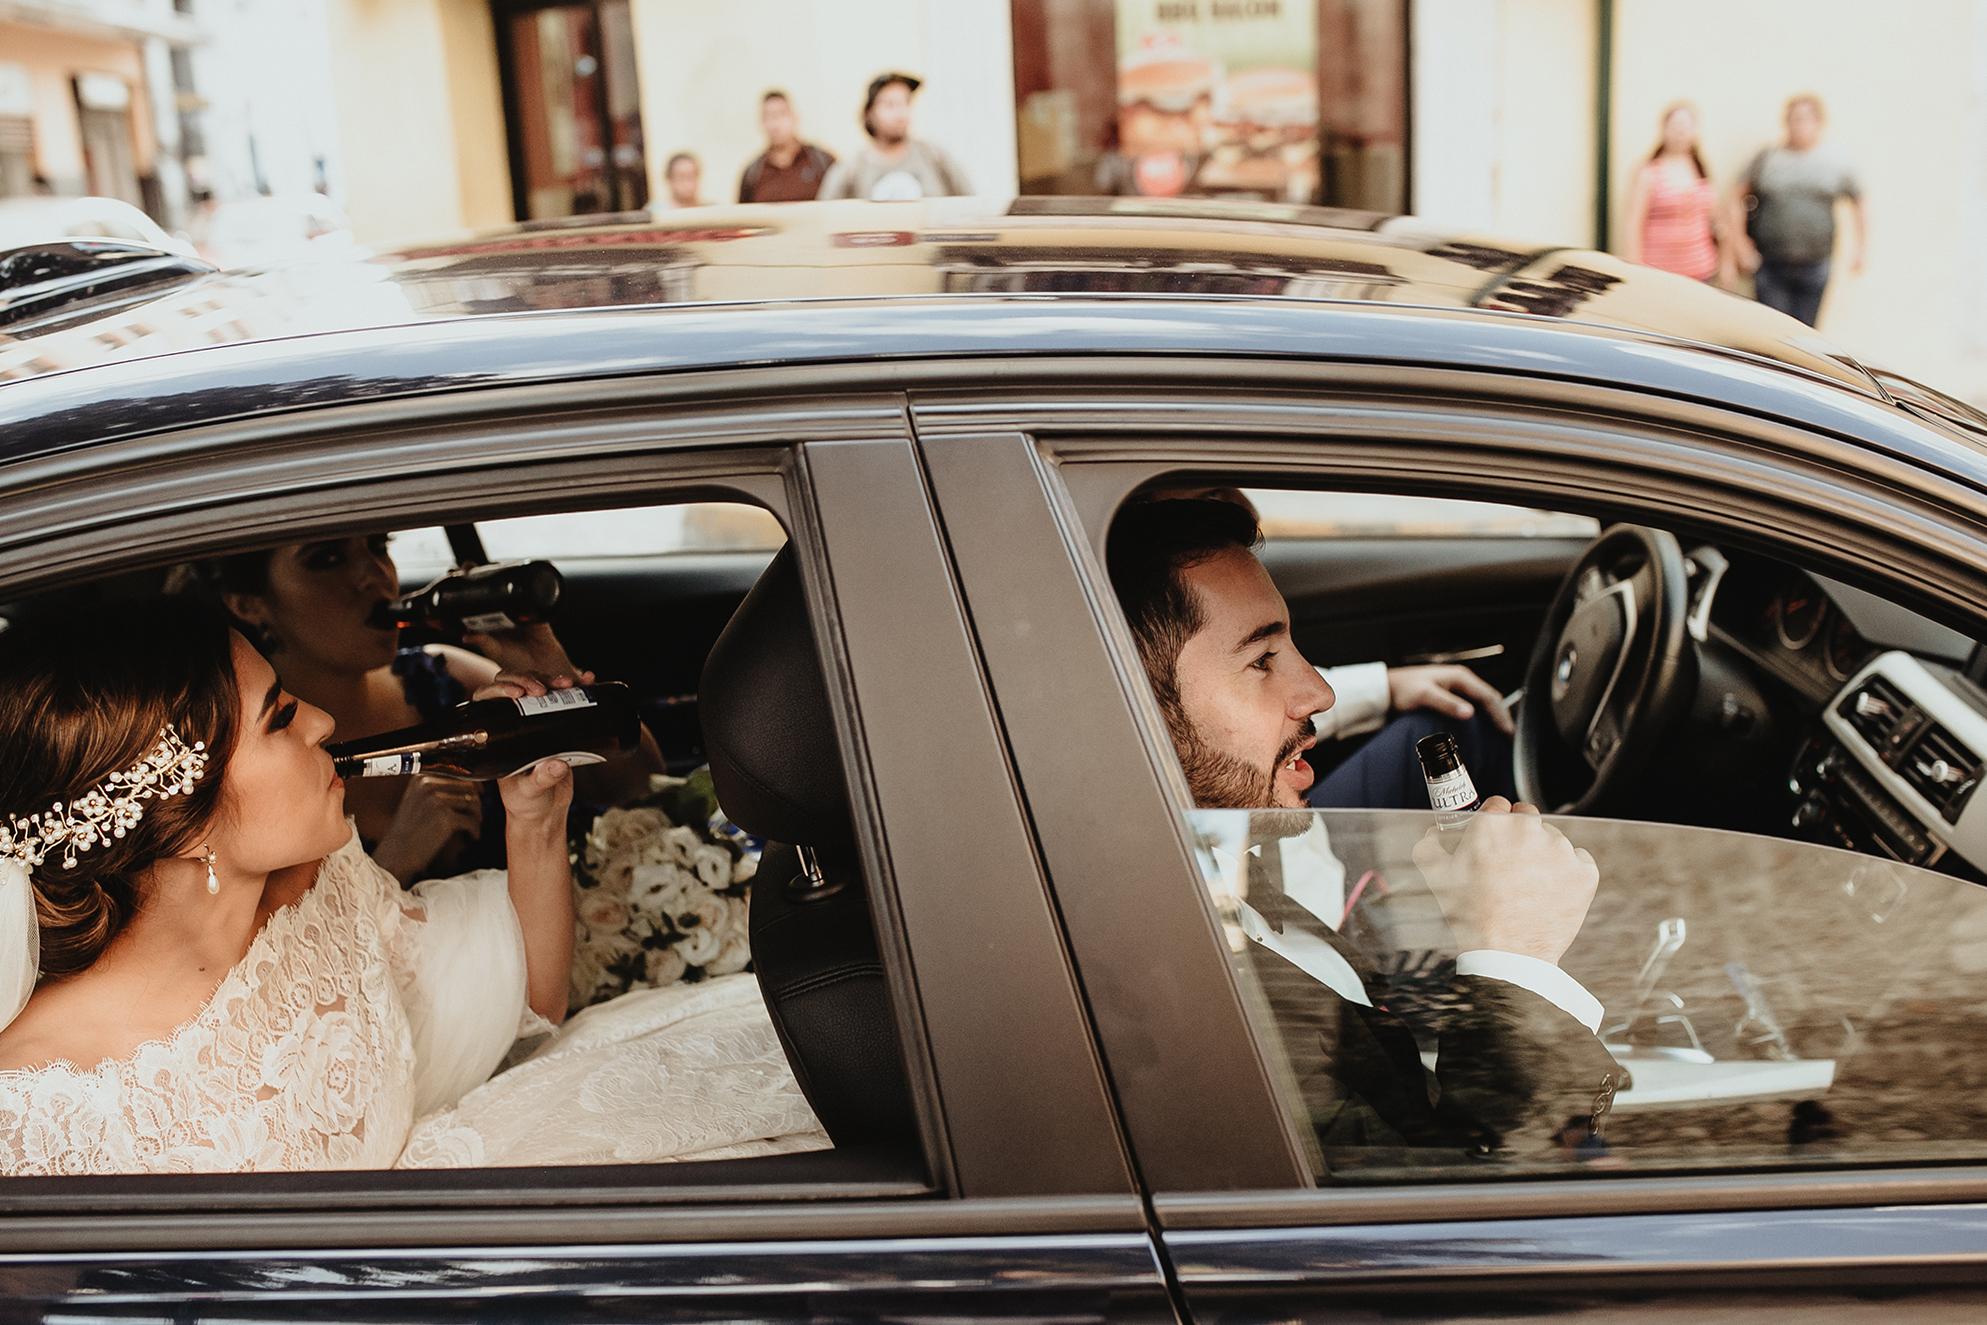 0195F&Yslide_WeddingDstination_MeridaYucatan_HaciendasMerida_BodasMexico_BodasYucatan_Boda_Destino.jpg